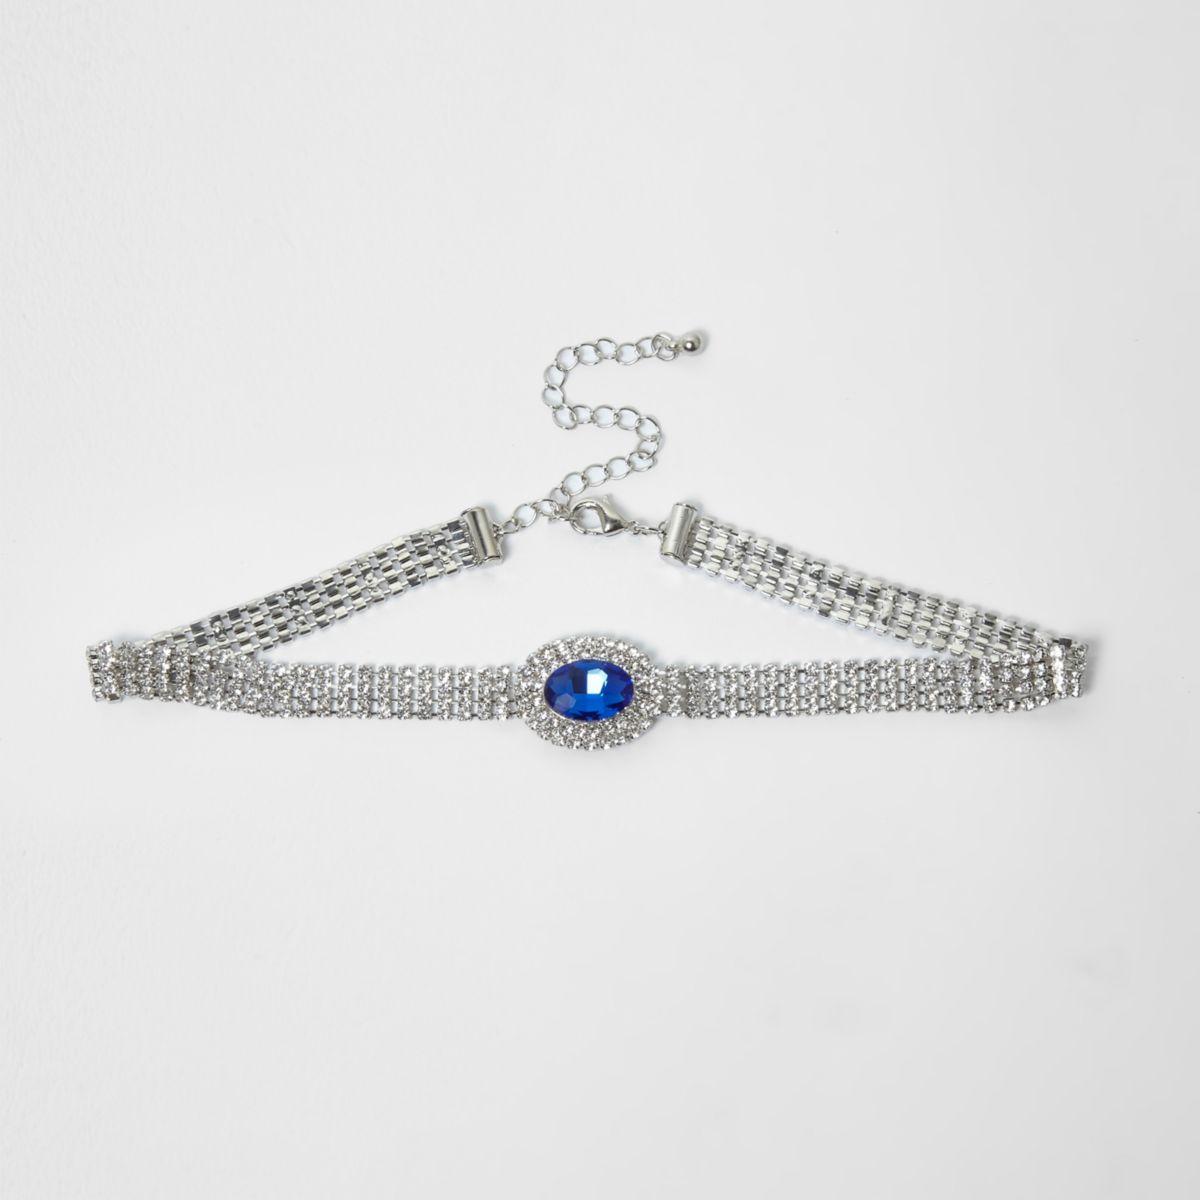 Silver tone cup chain blue jewel choker